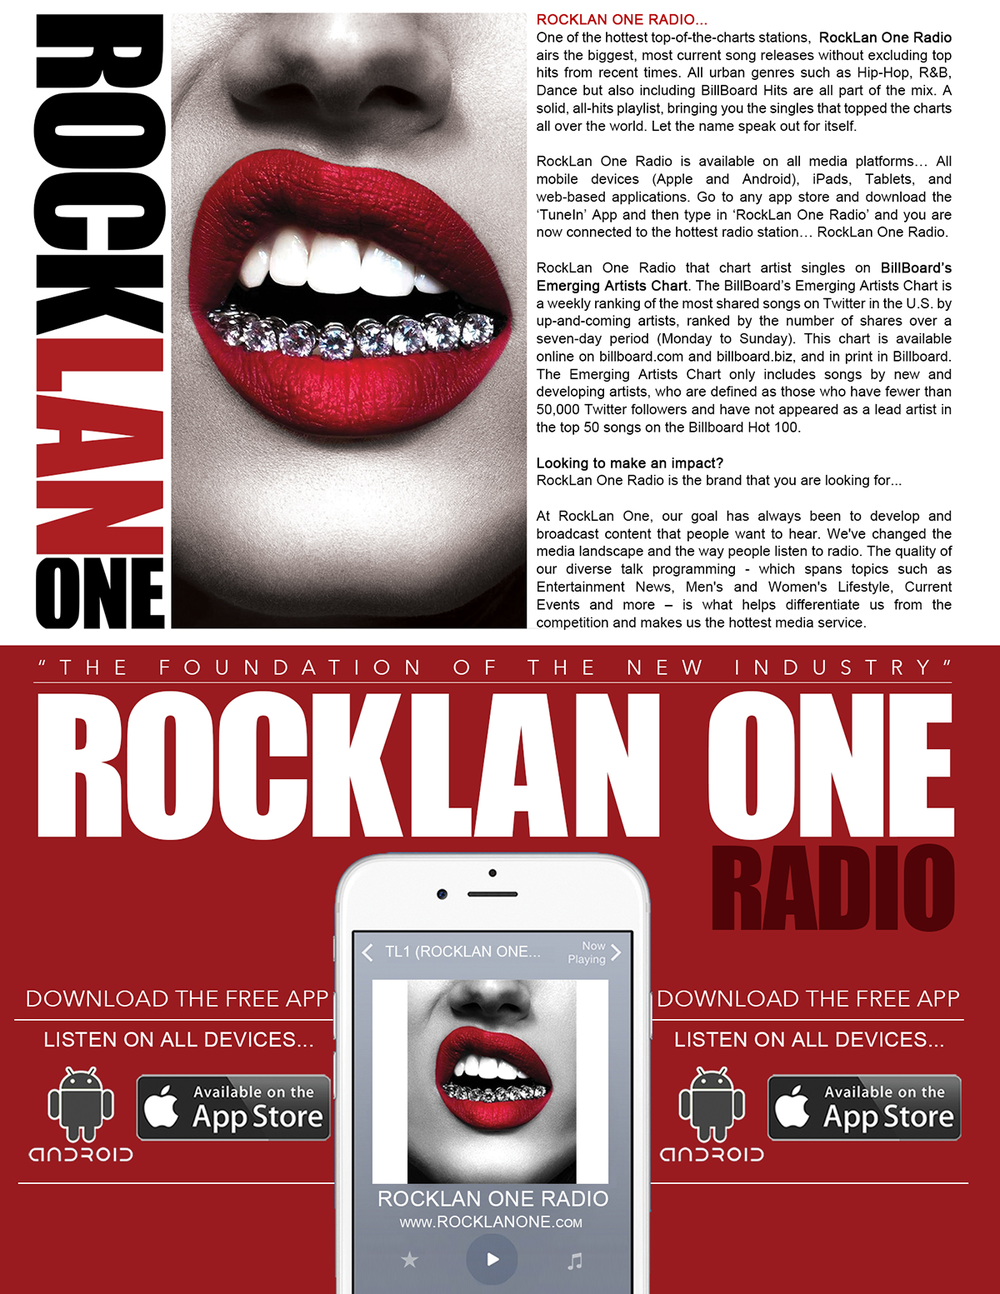 RockLanOne_radio02.png